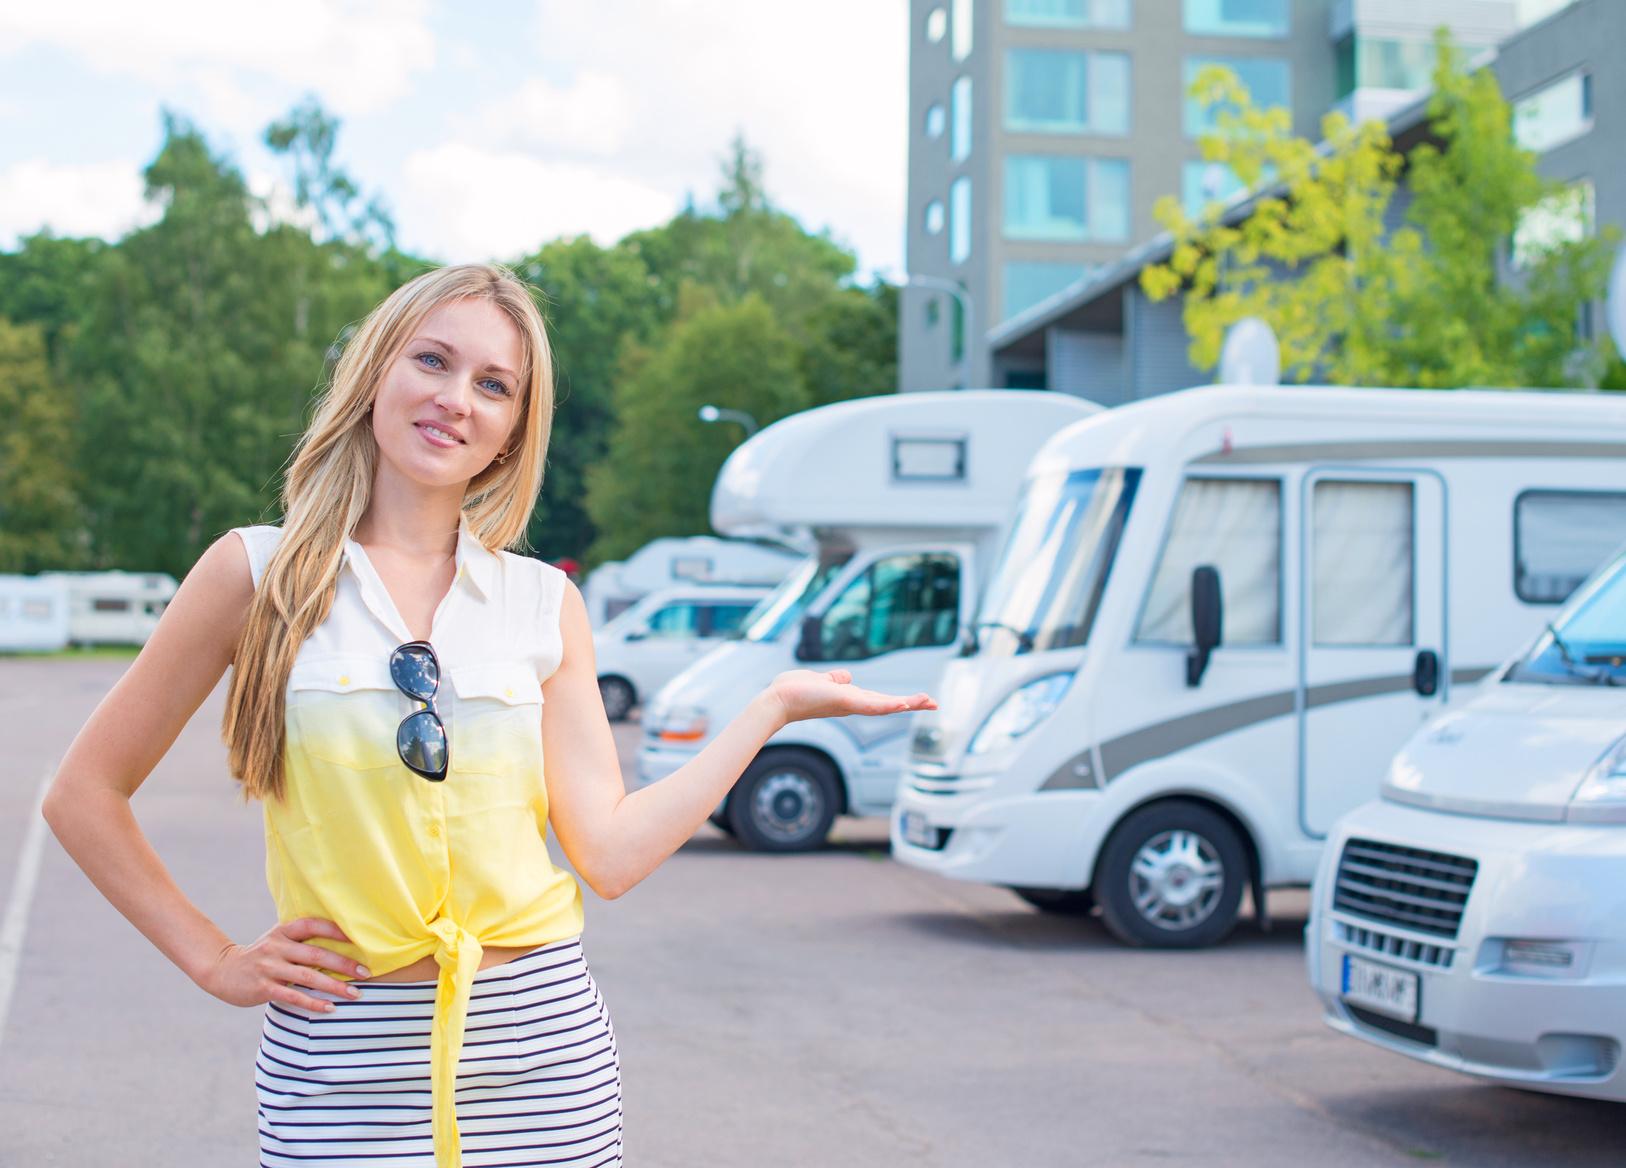 Vendre Son Camping Car Ou Sa Caravane Imprimer Le Certificat De